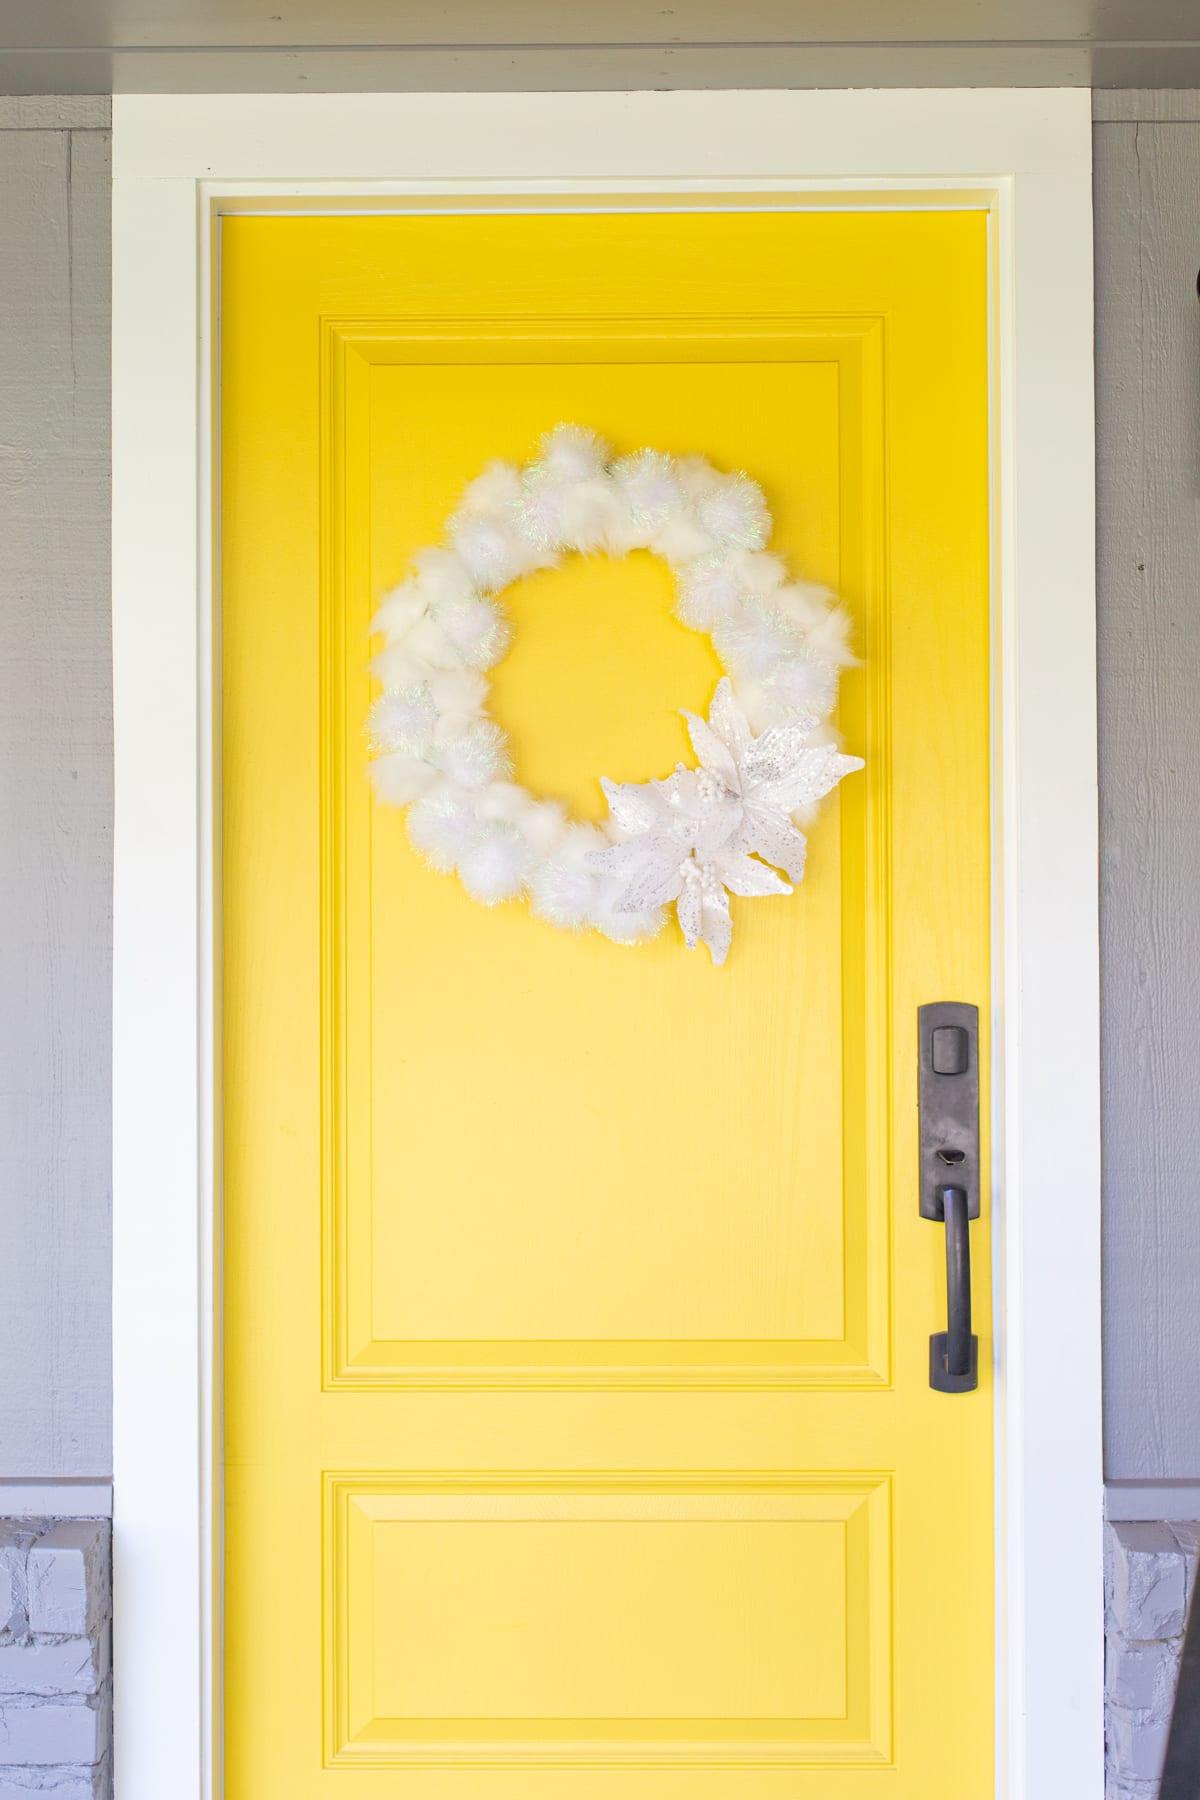 17 Sparkling DIY Winter Decor Ideas Youll Enjoy Crafting